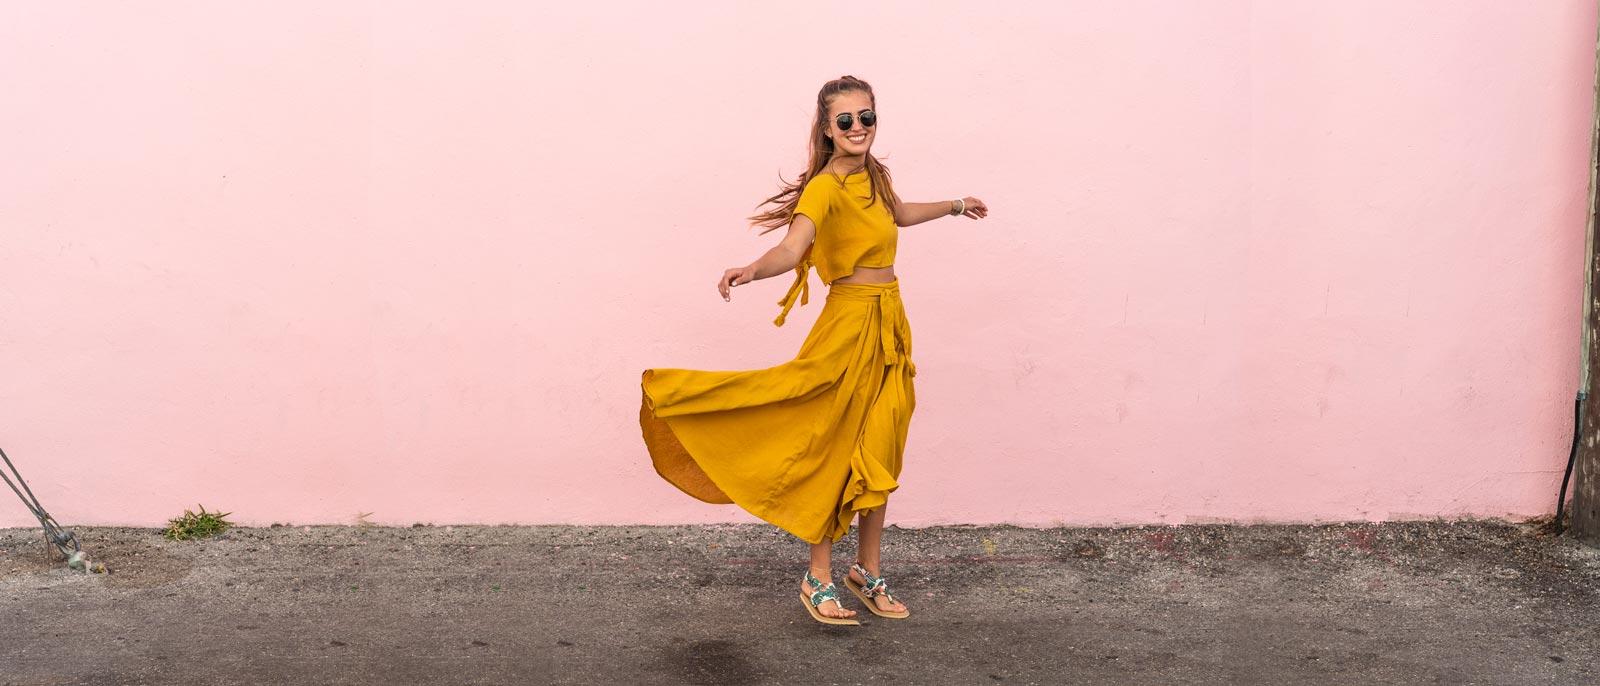 Lady in orange dress wearing Sanuk sandals.